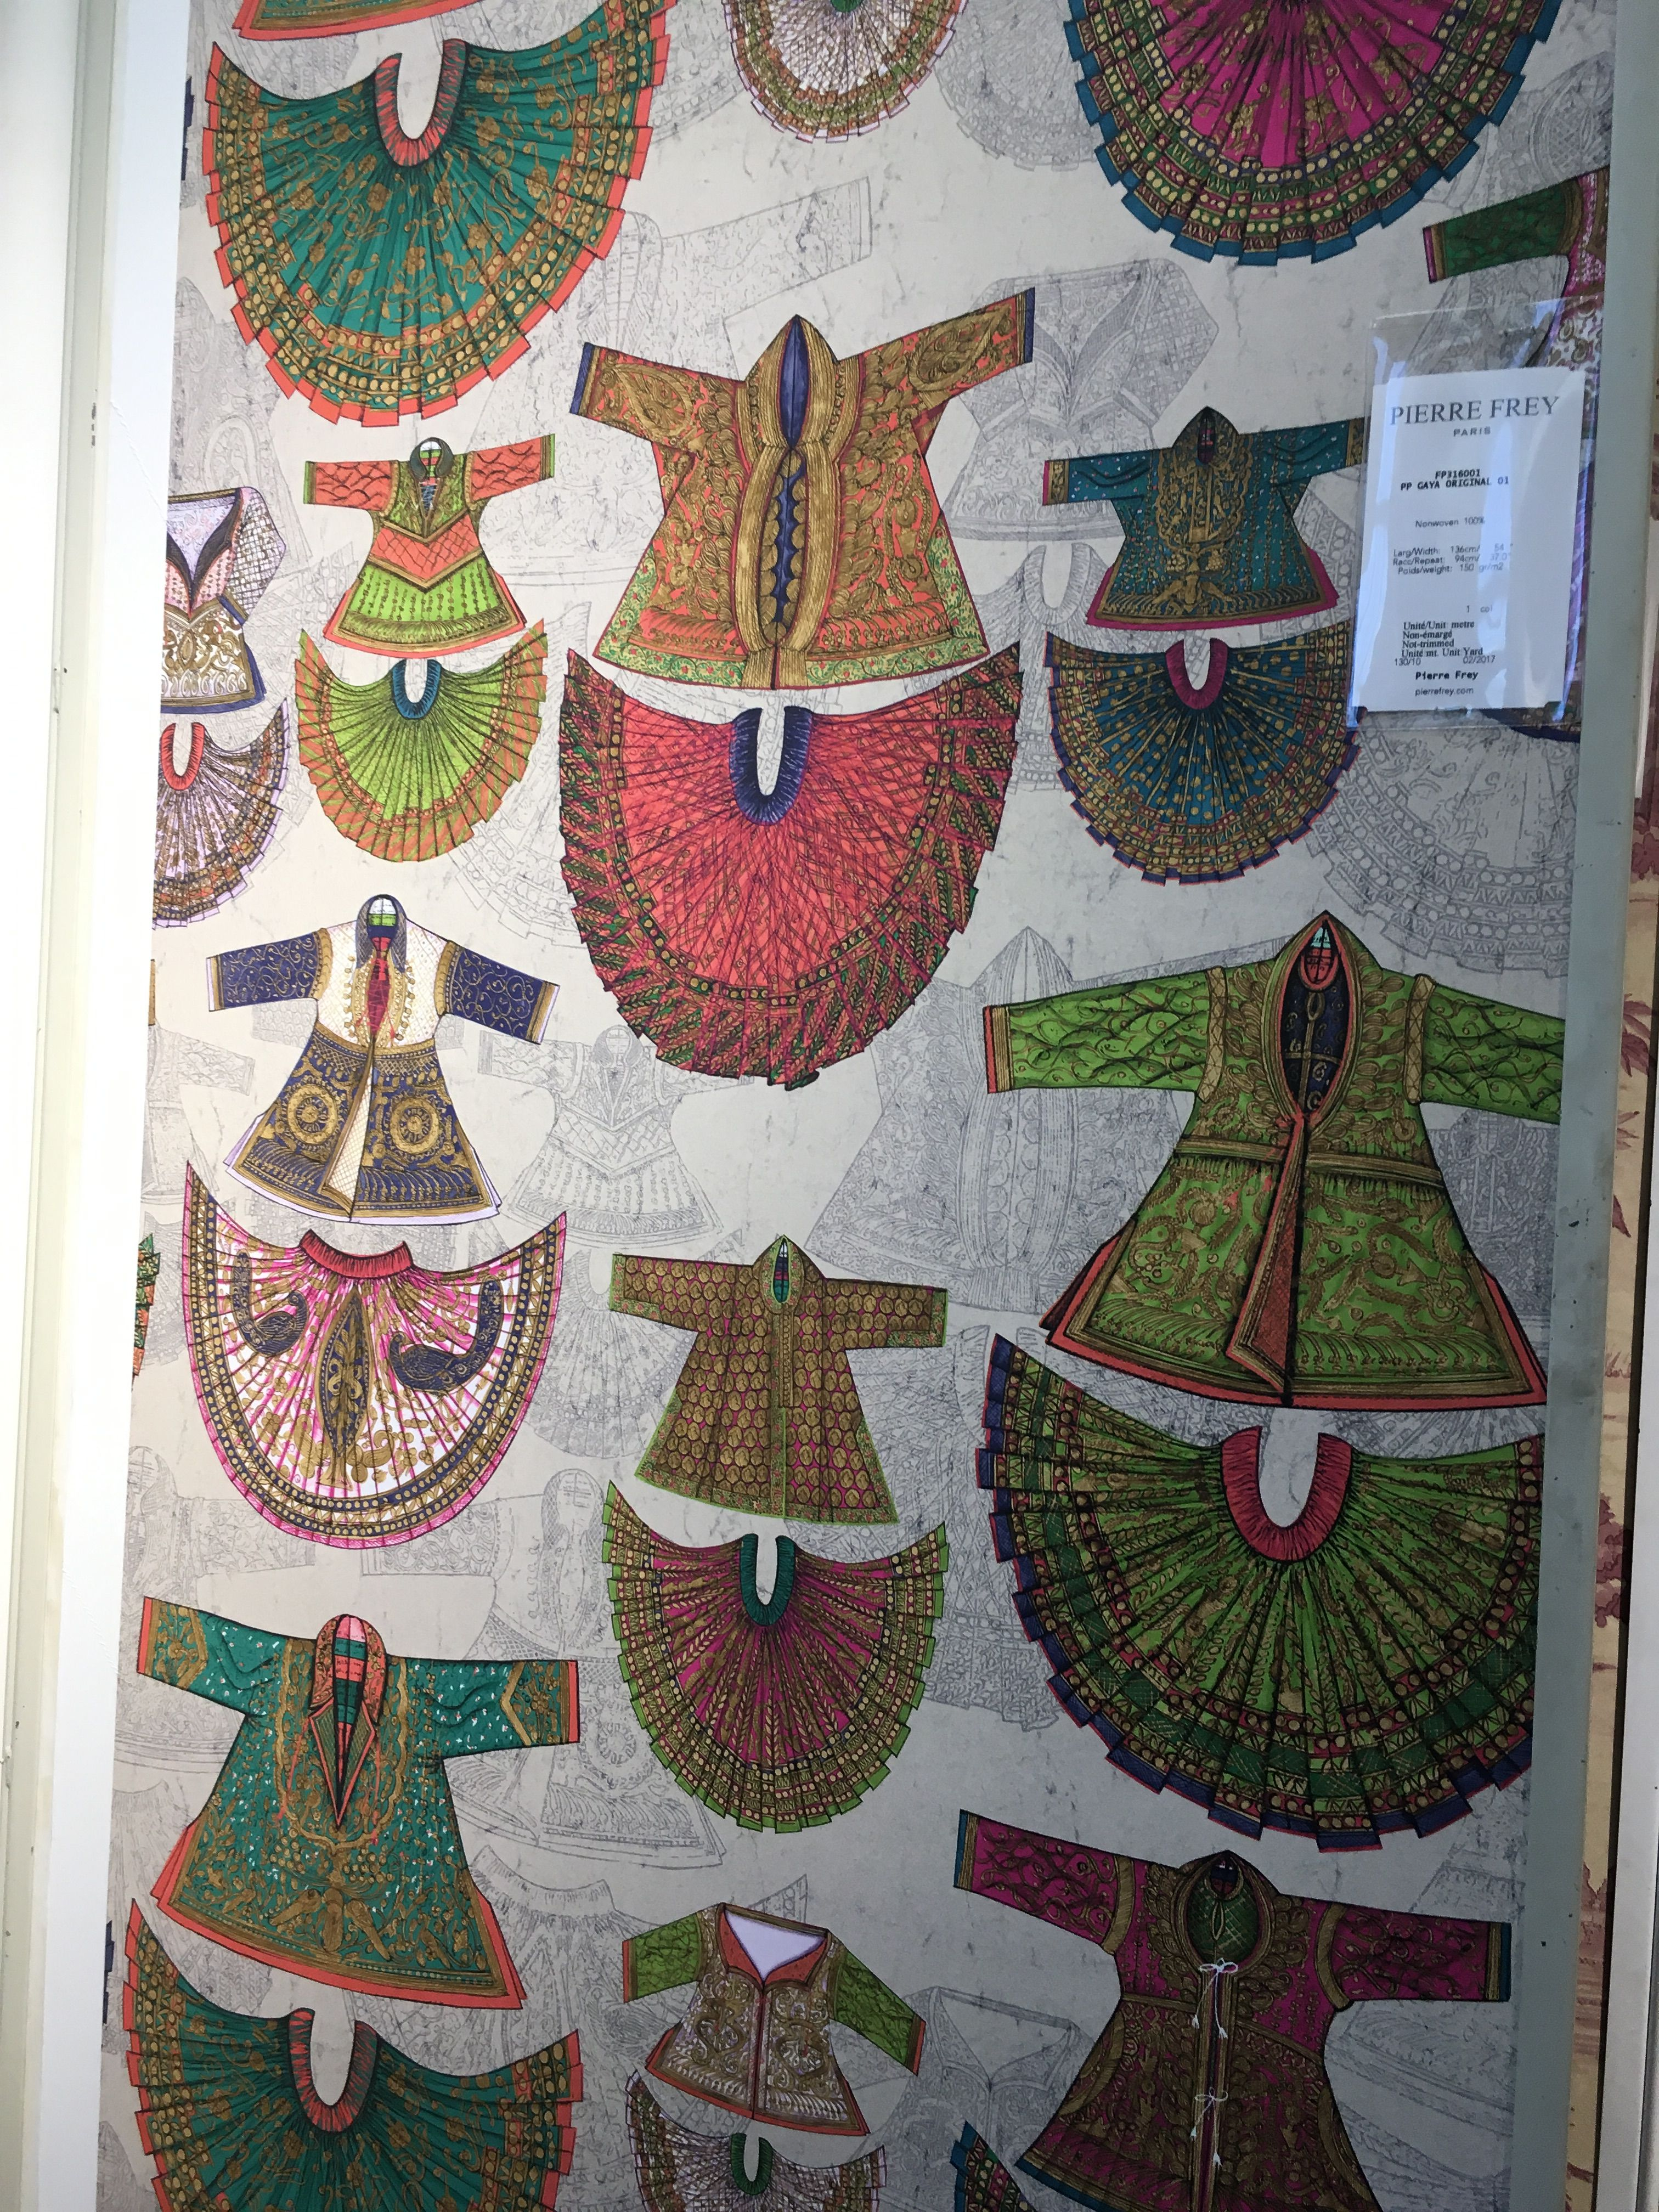 Gaya Original wallpaper FP316001 by Pierre Frey